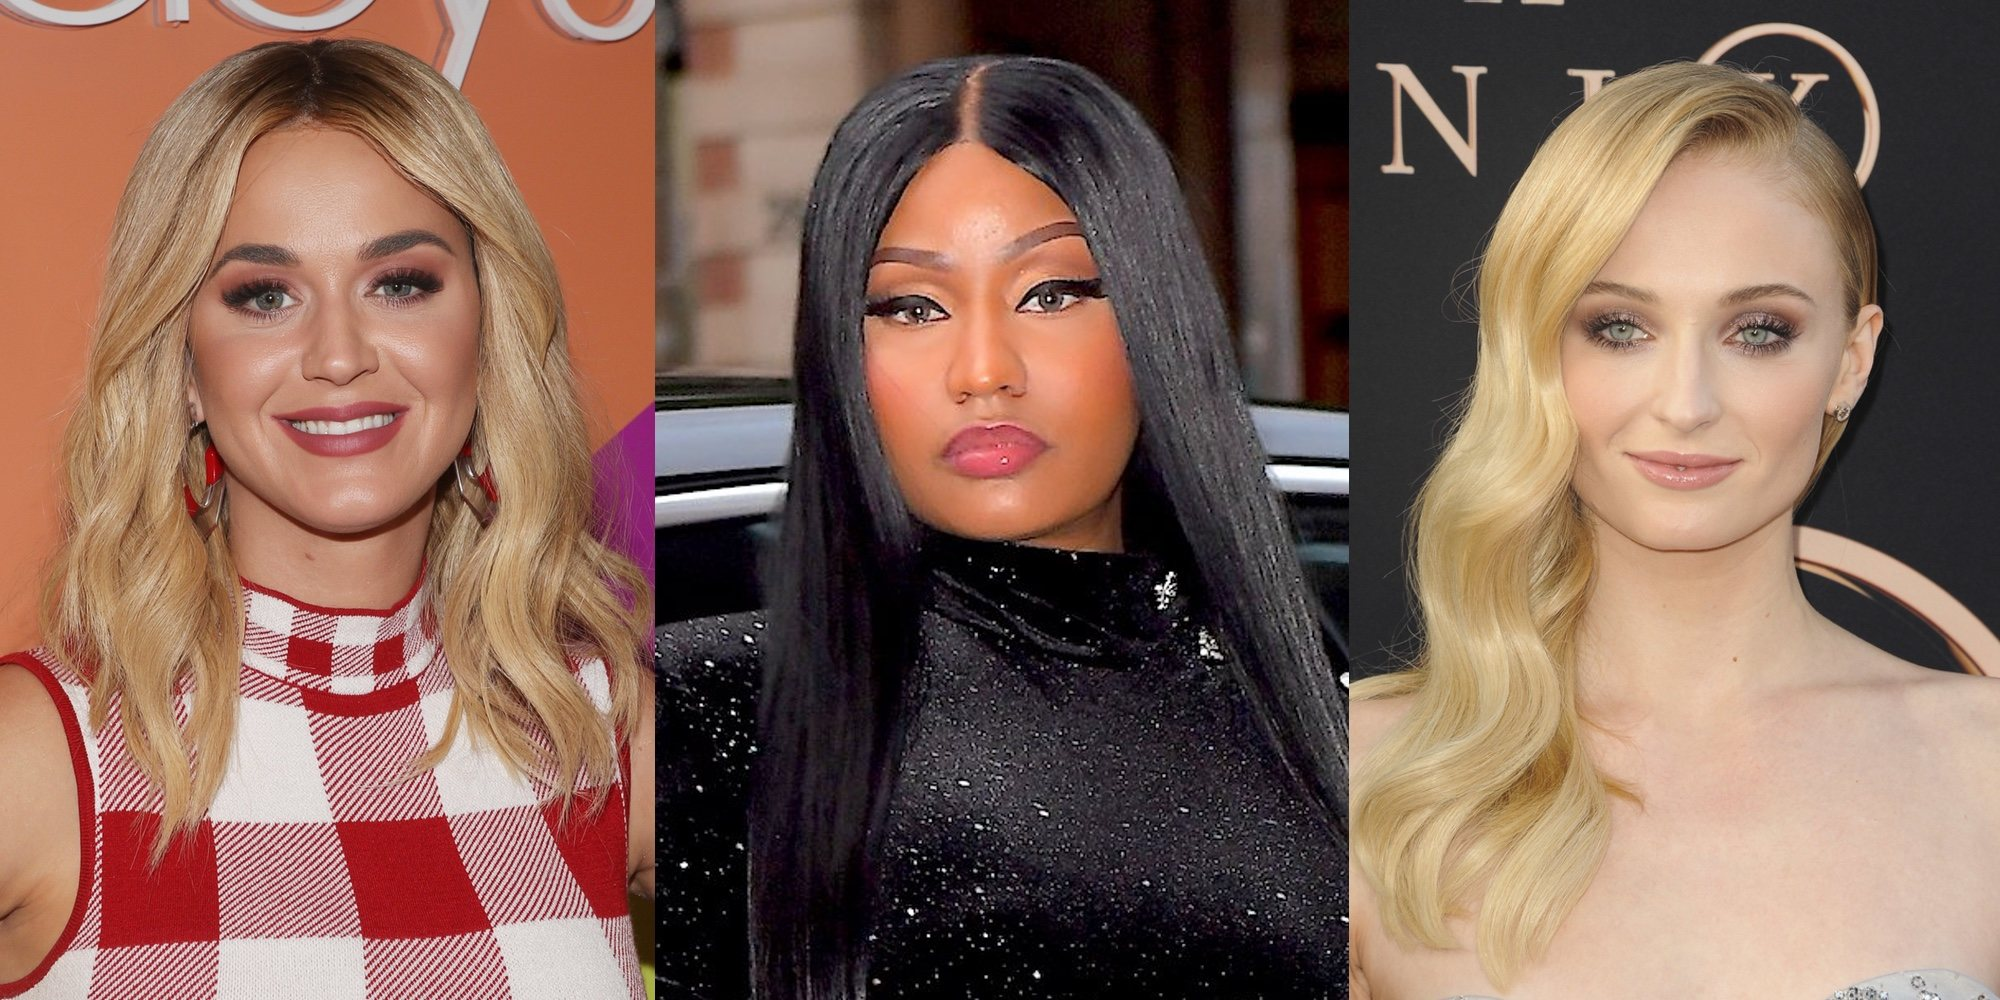 Katy Perry, Gigi Hadid, Nicki Minaj, Sophie Turner,... las celebs que se han estrenado como madres en 2020